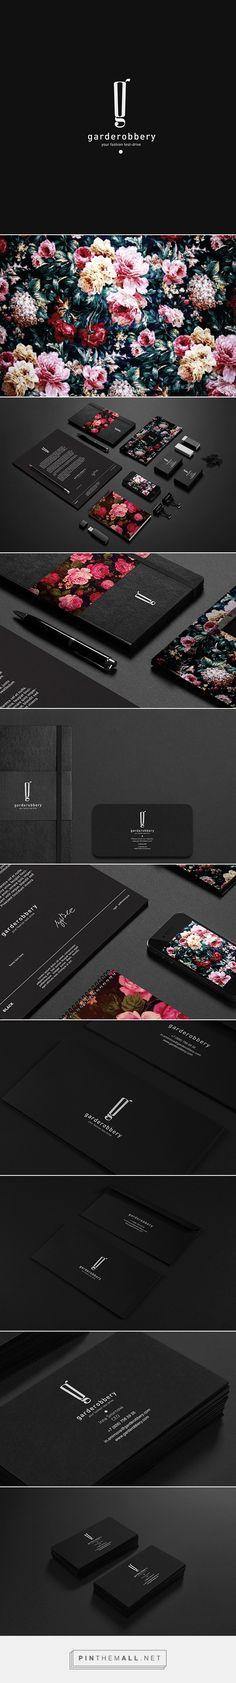 Garderobbery Branding by Pavel llyuk on Behance | Fivestar Branding – Design and Branding Agency & Inspiration Gallery